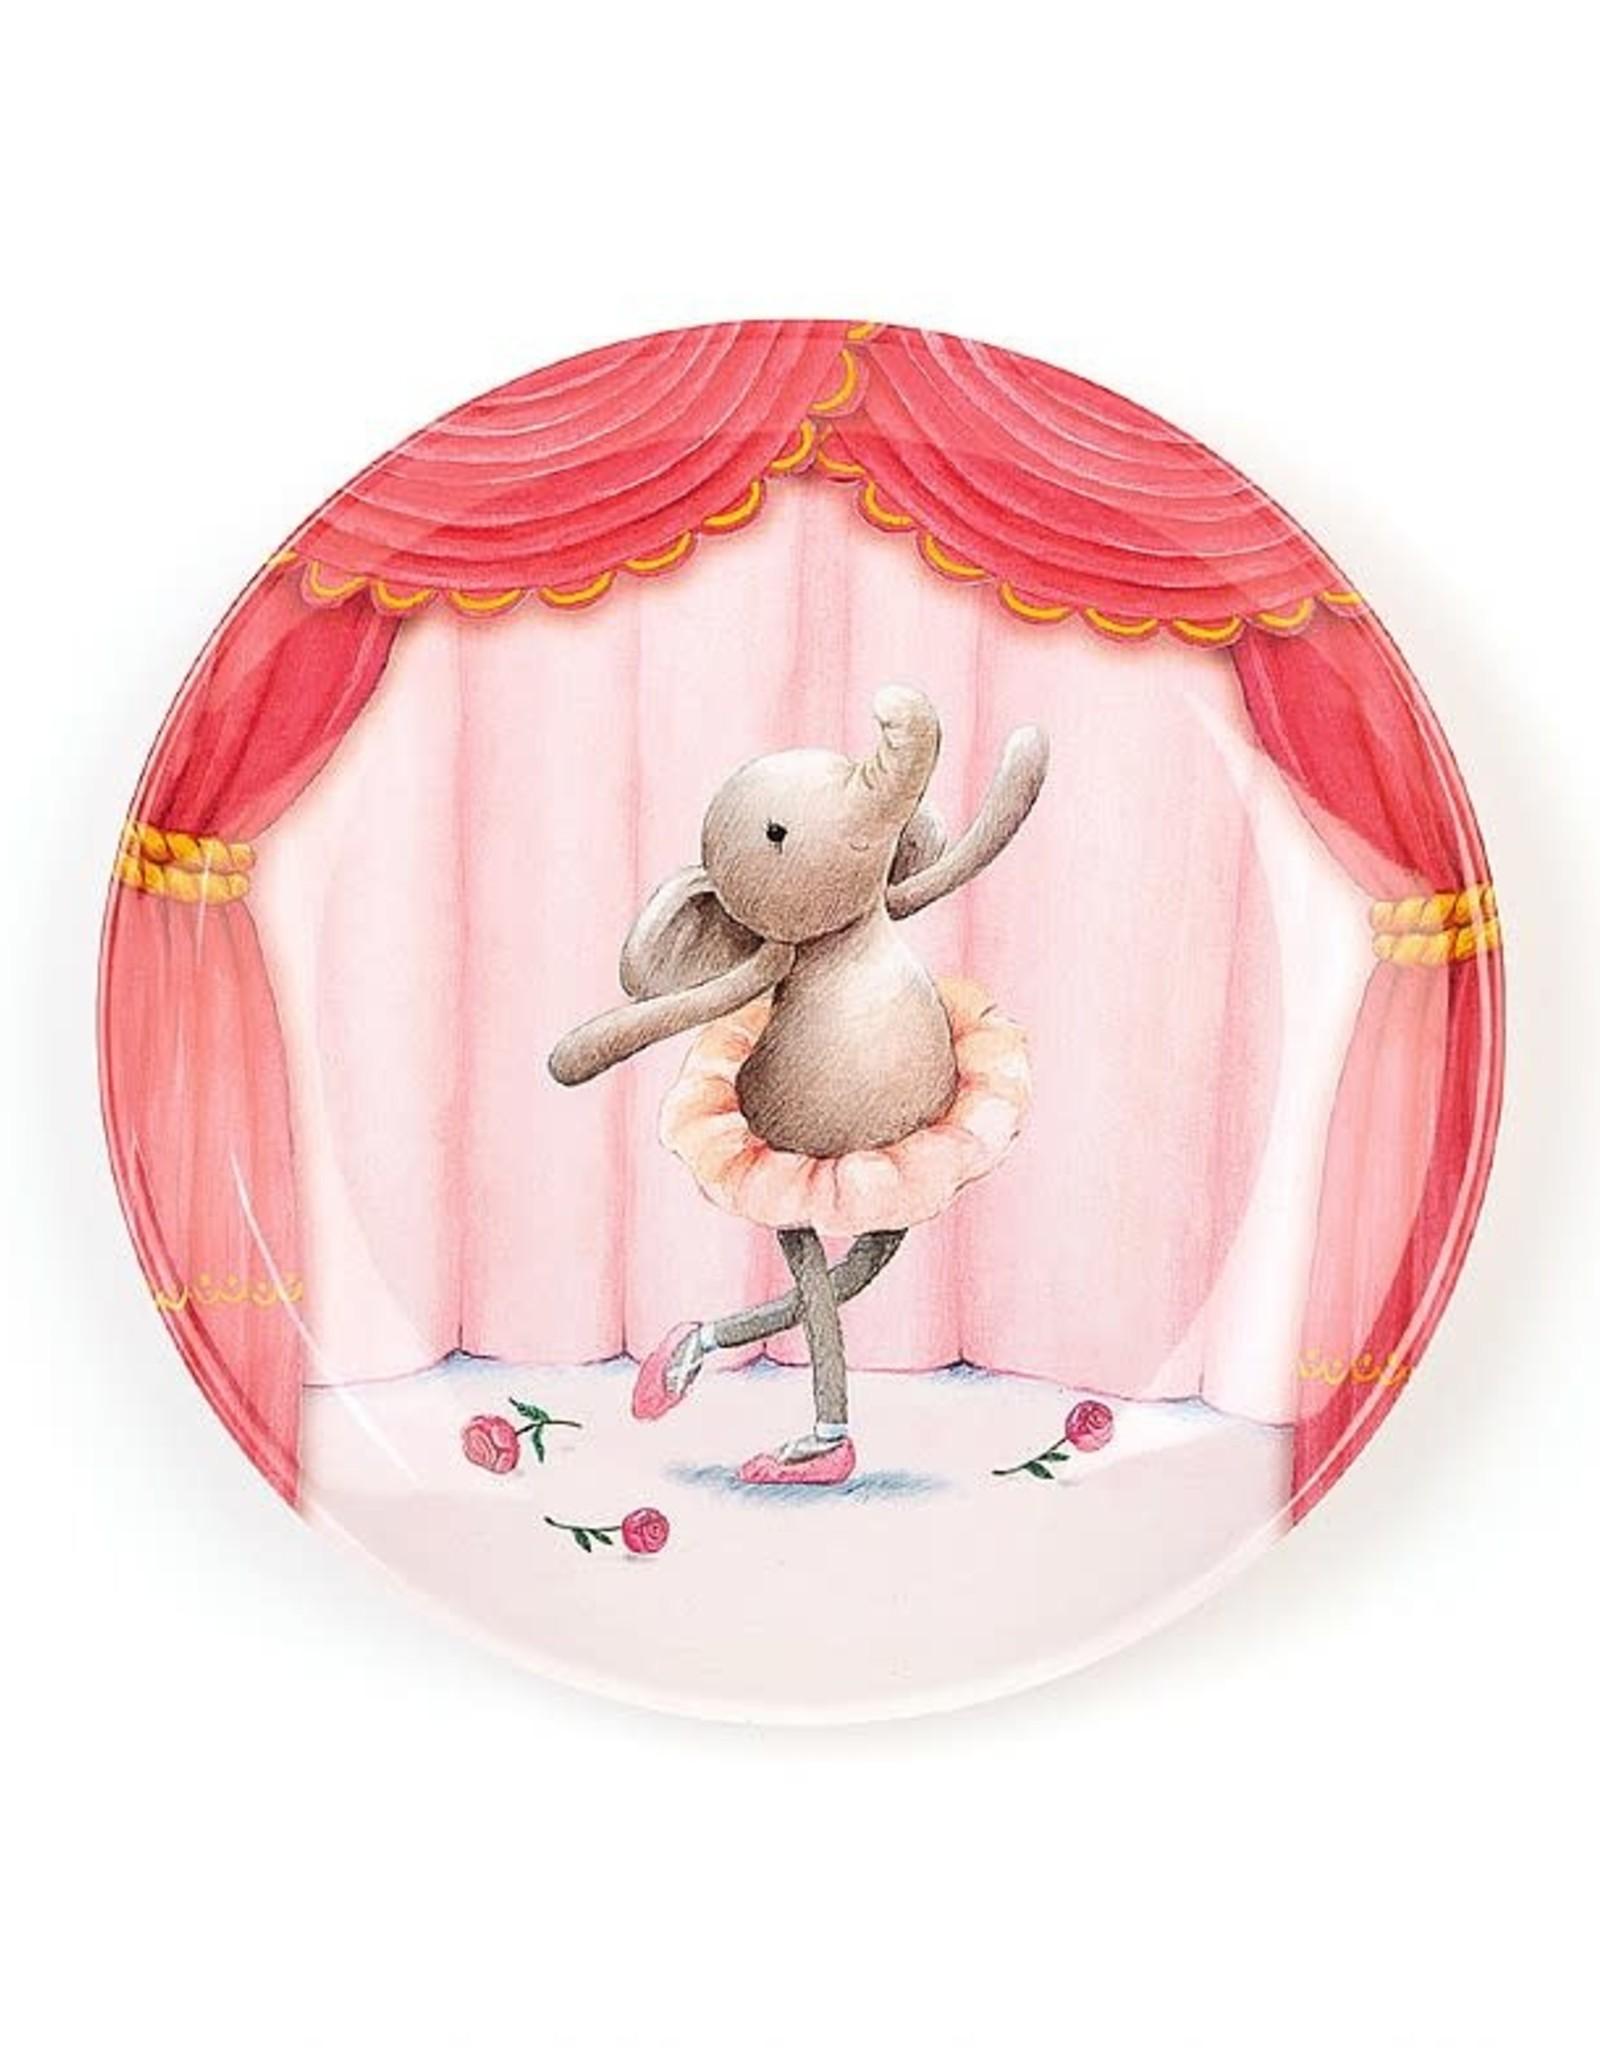 Jellycat Inc. Jellycat Elly Ballerina Melamine Plate